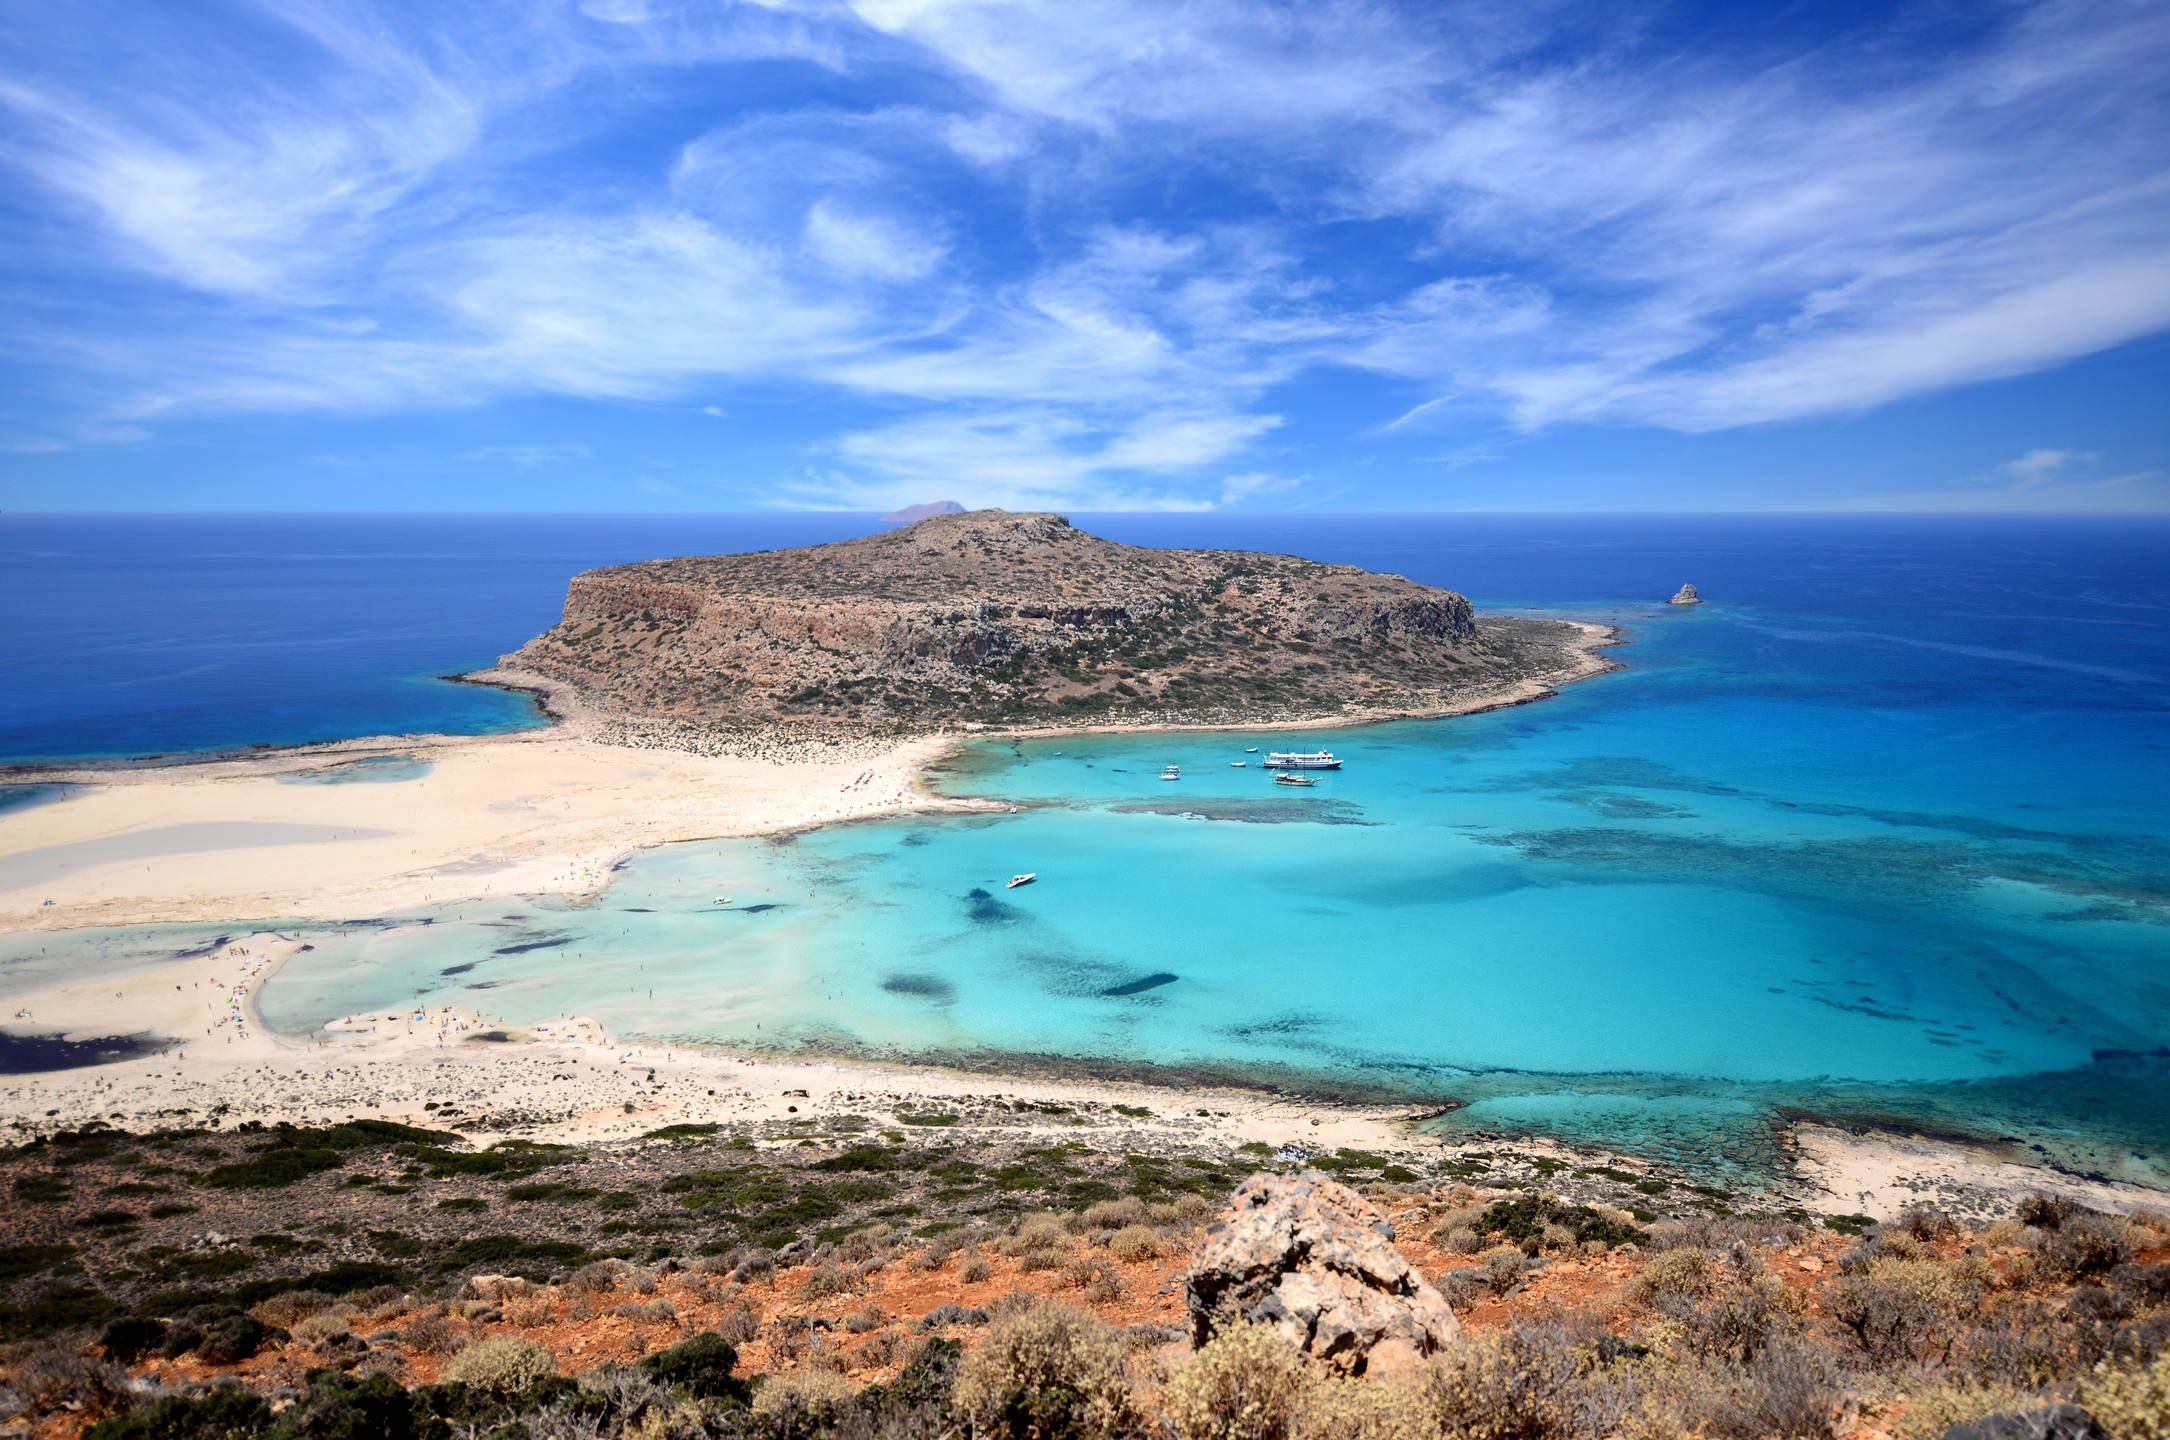 Panorama Sea of KritiCrete Island Greece Nature Crete island 2170x1440